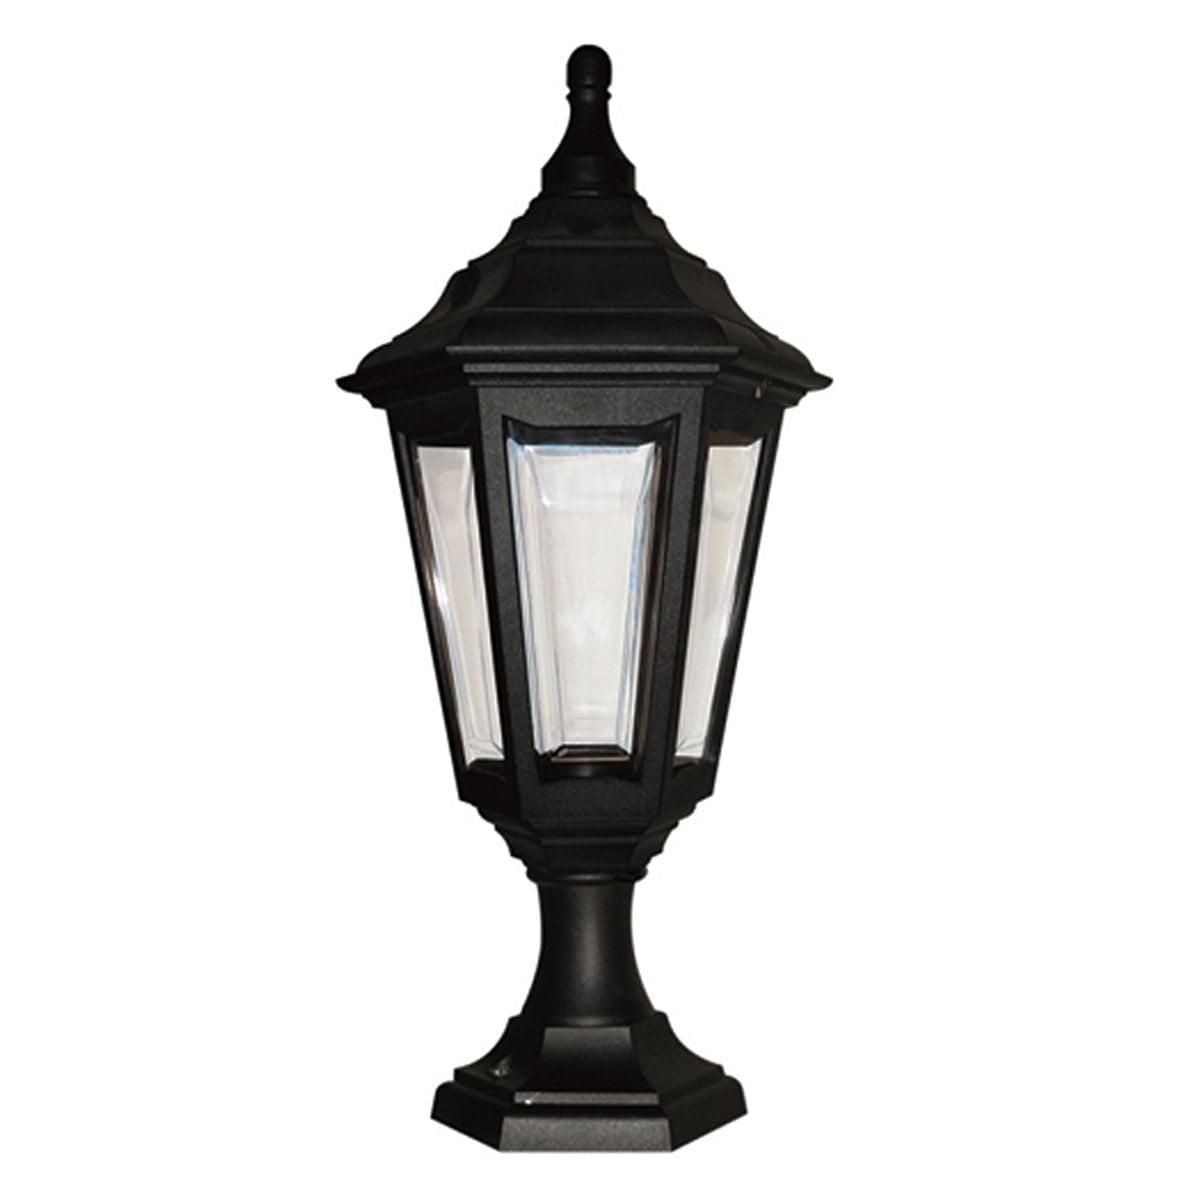 Elstead KINSALEPED/POR Kinsale Pedestal/Porch Lantern